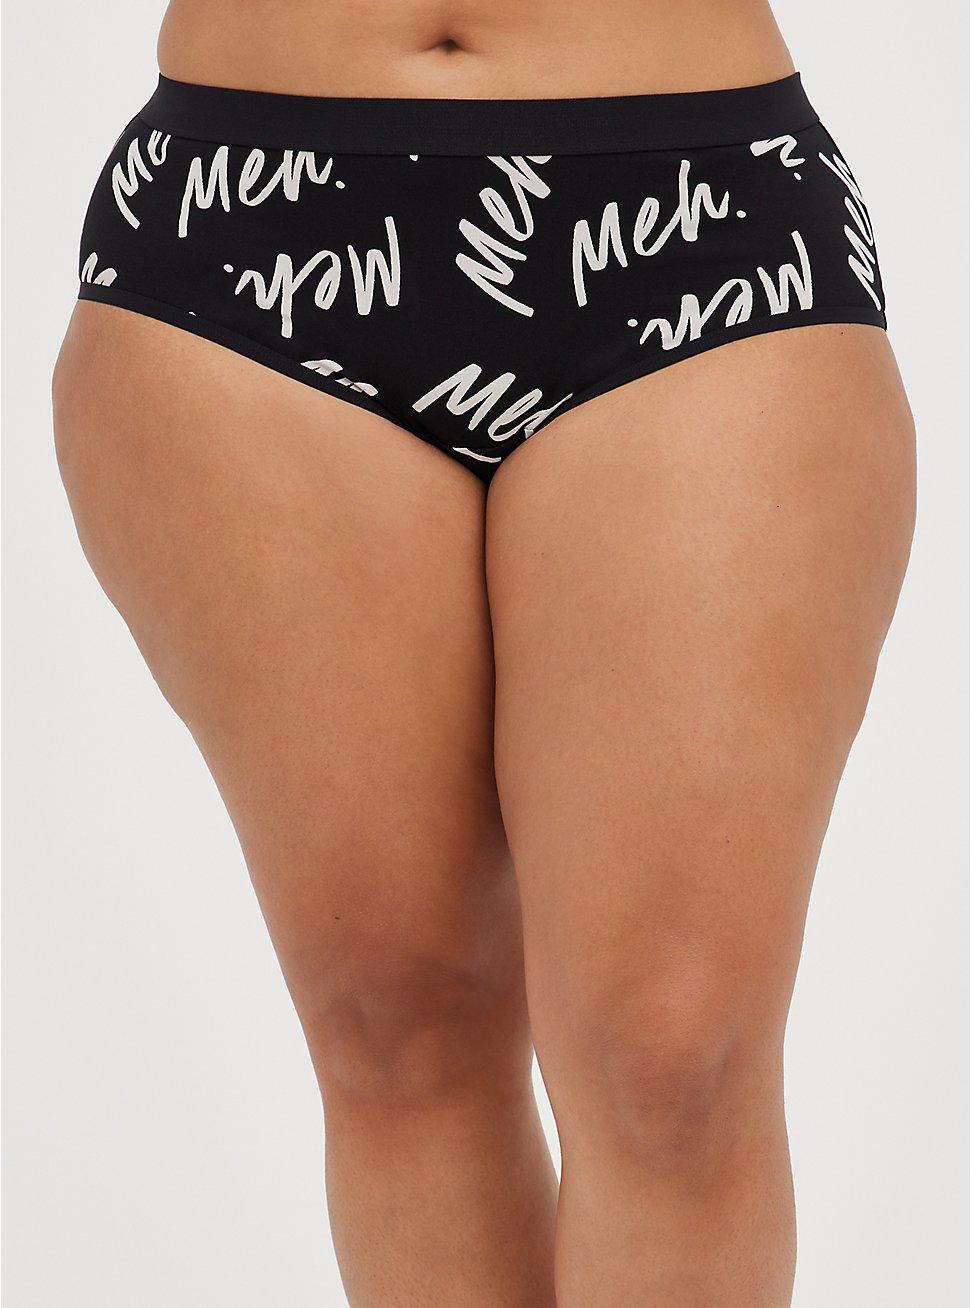 Cheeky Panty - Cotton Meh Black, MEH REPEAT BLACK, hi-res